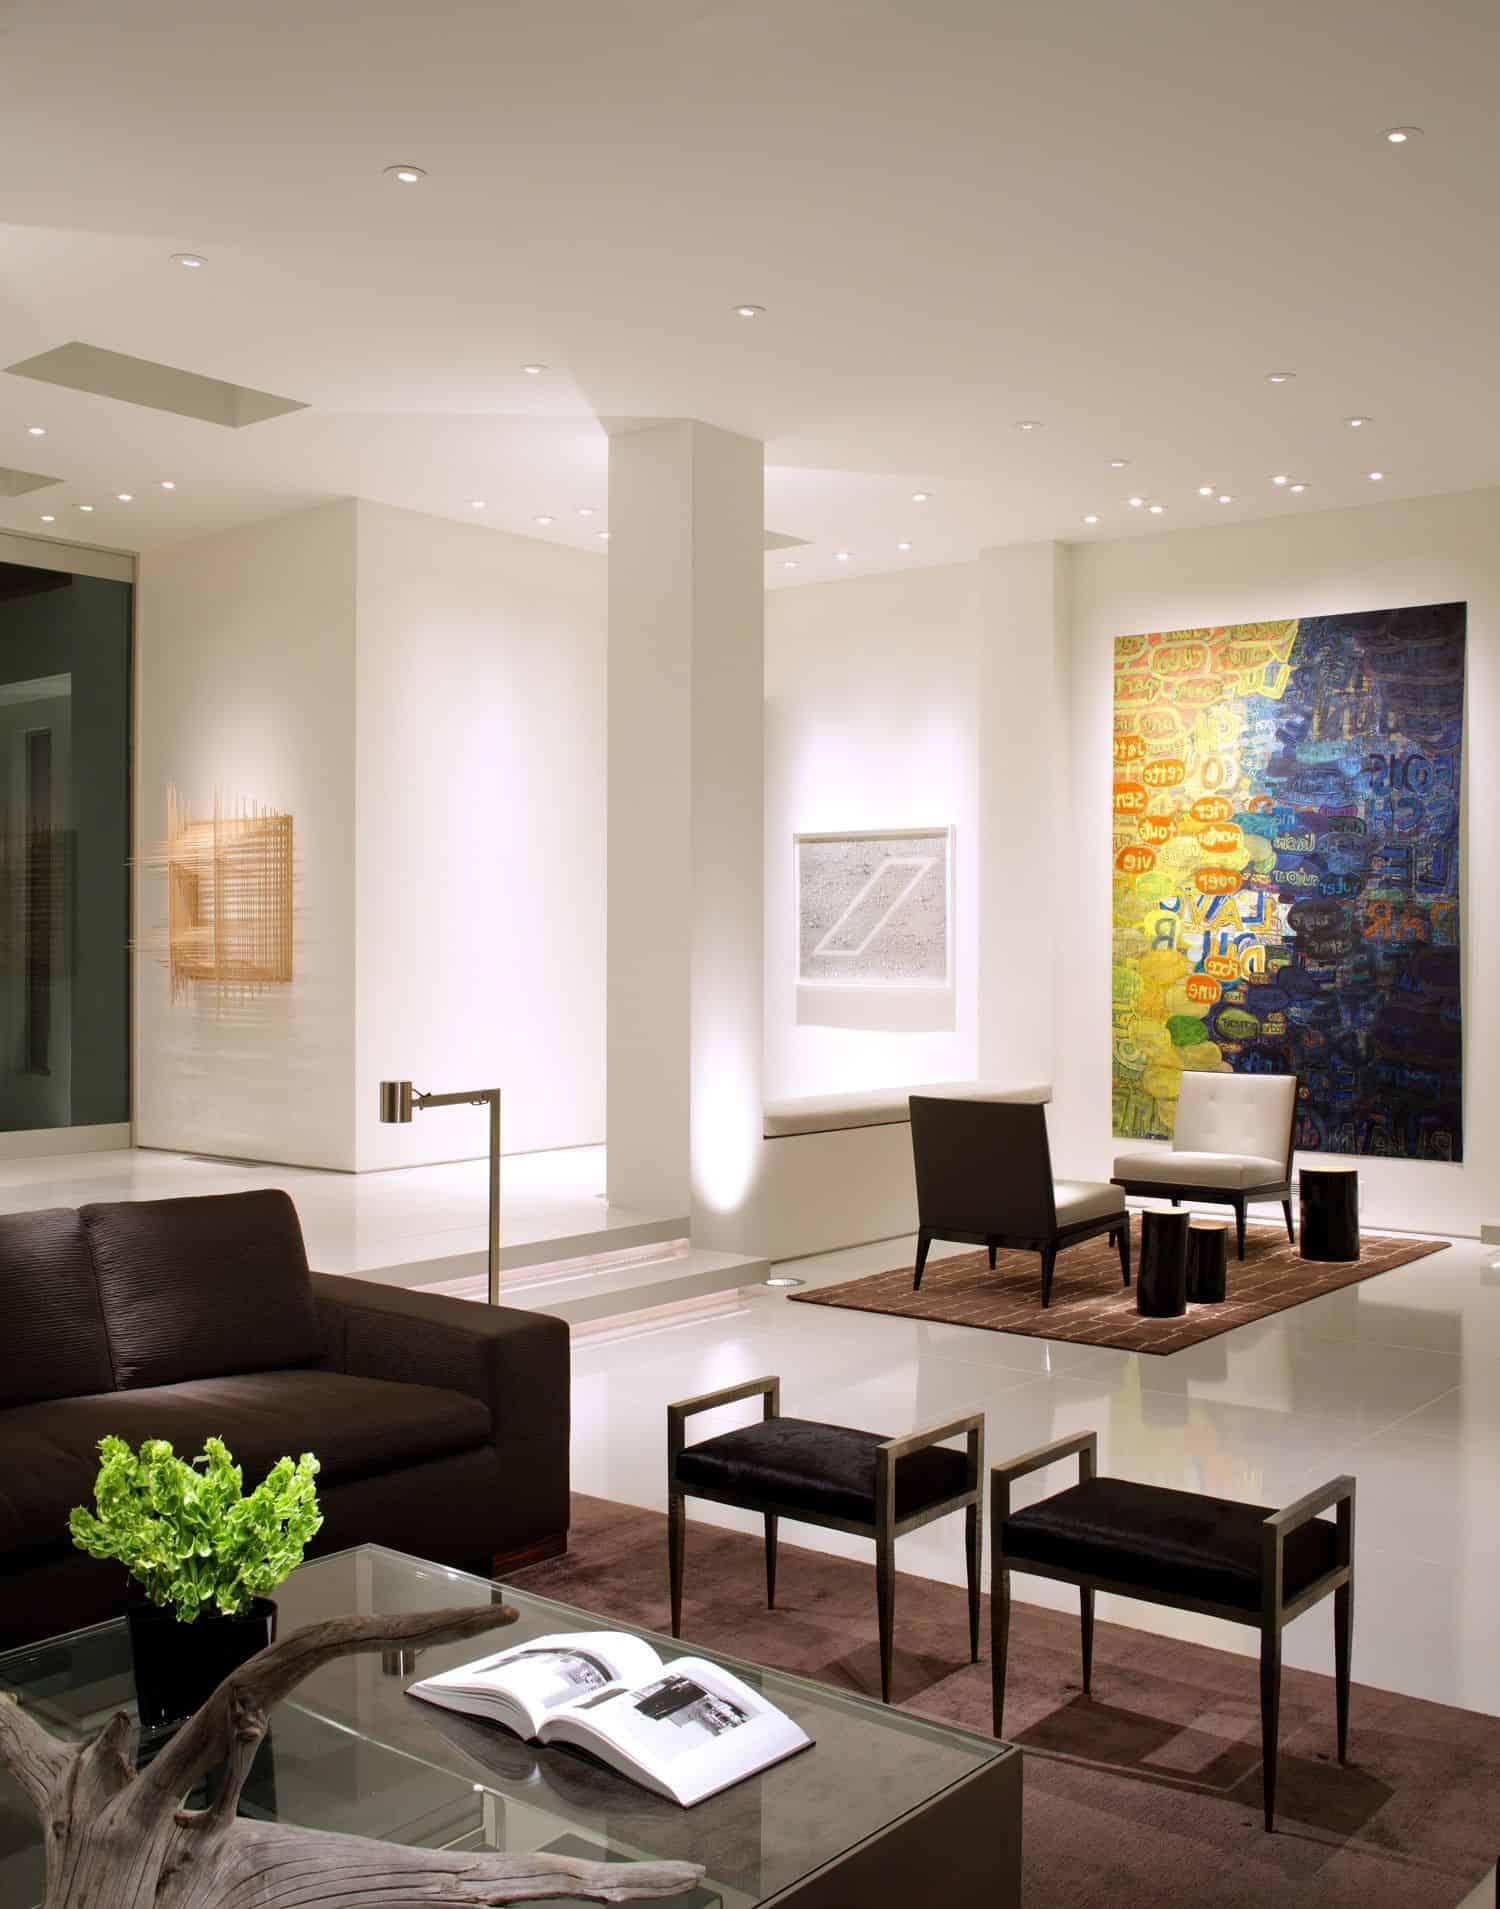 Modern-Residence-Architecture-Magni Design-15-1 Kindesign